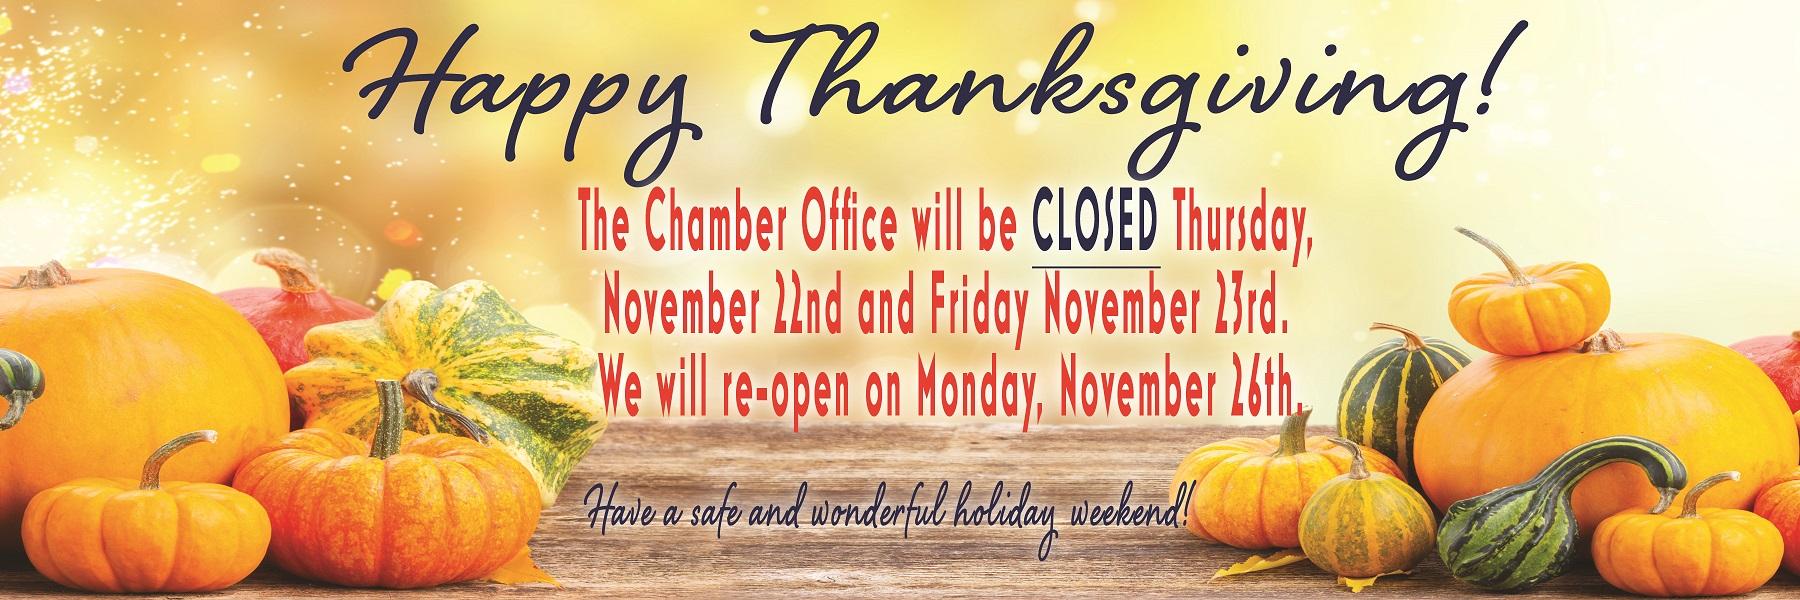 2018-Thanksgiving-Chamber-Closed-Banner-Size.jpg